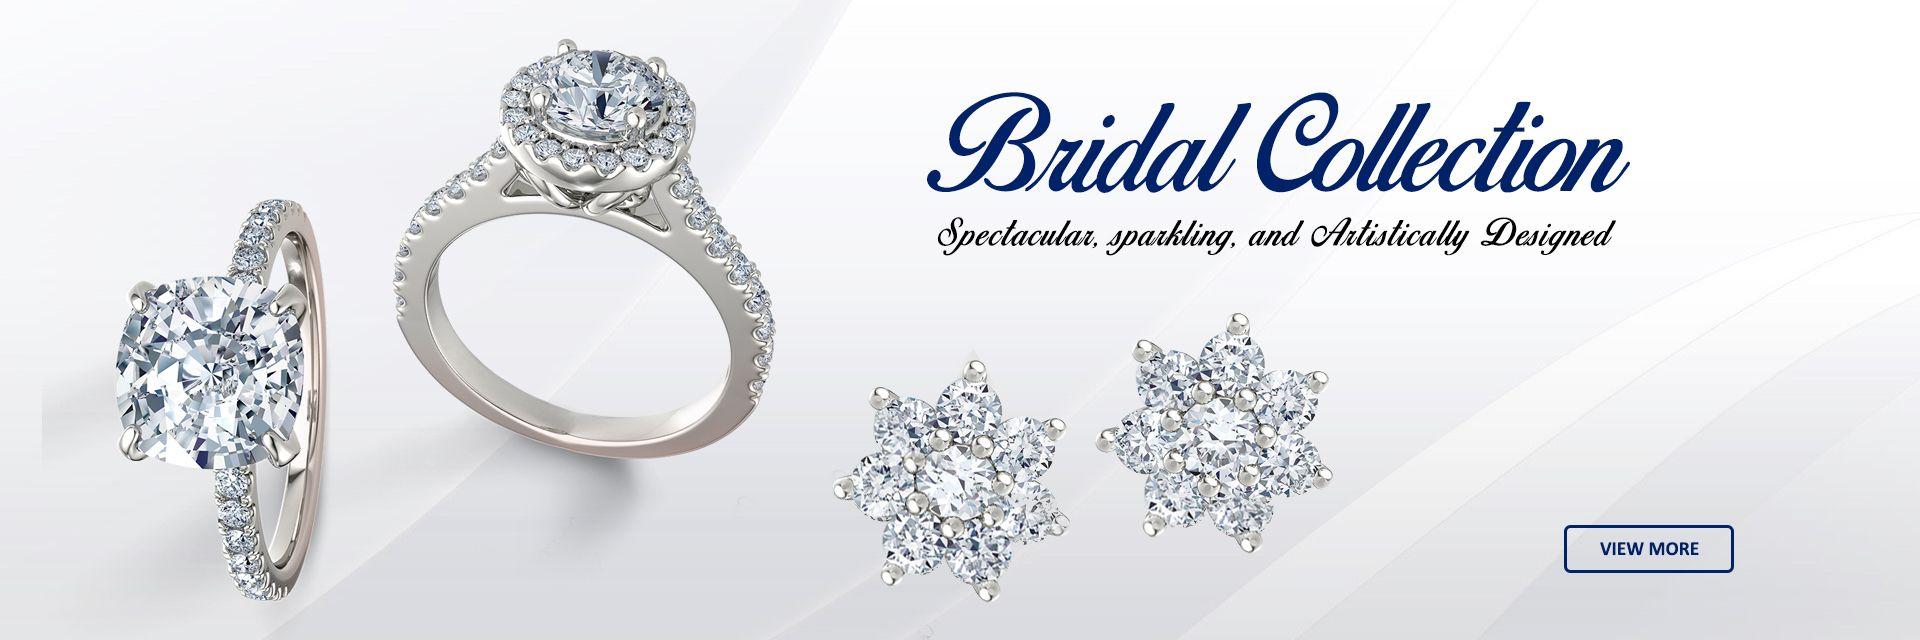 Fine Jewelry, diamonds – Engagement, Wedding Rings | JewelryNest